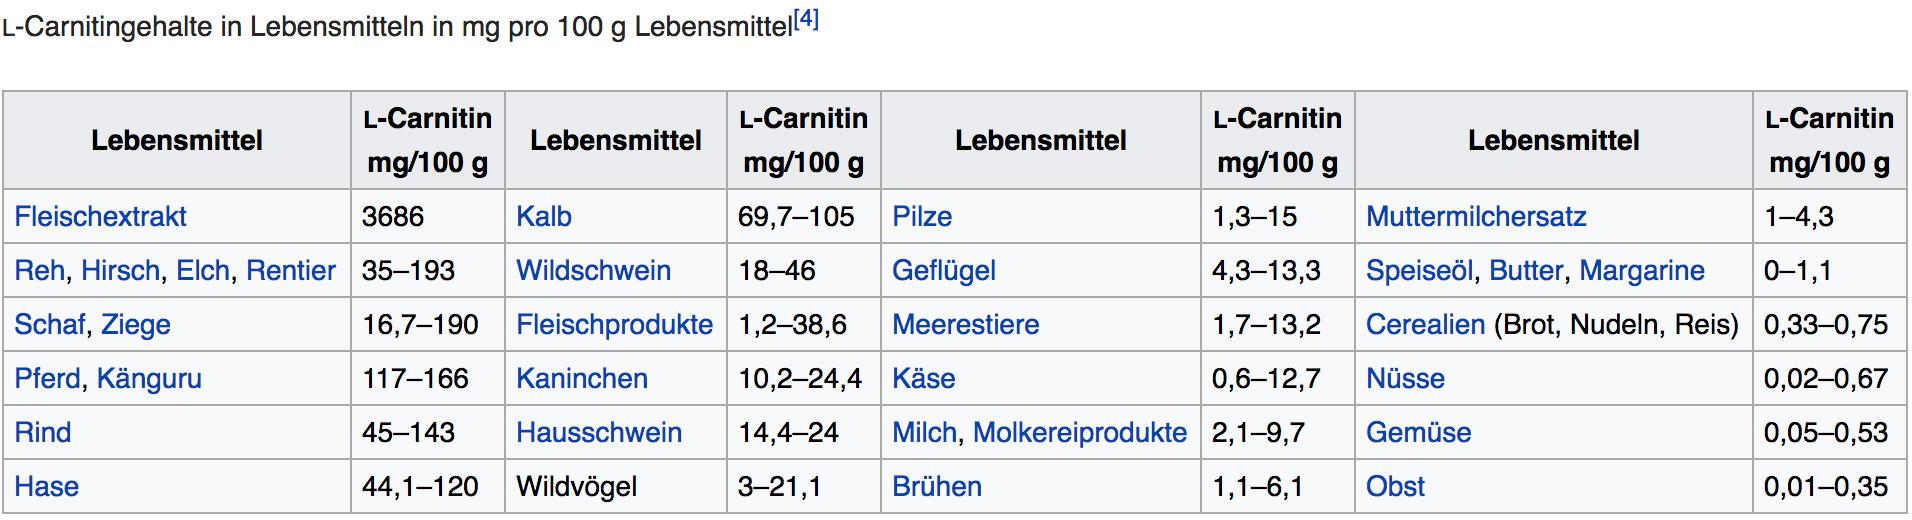 L-Carnitin Dosierung